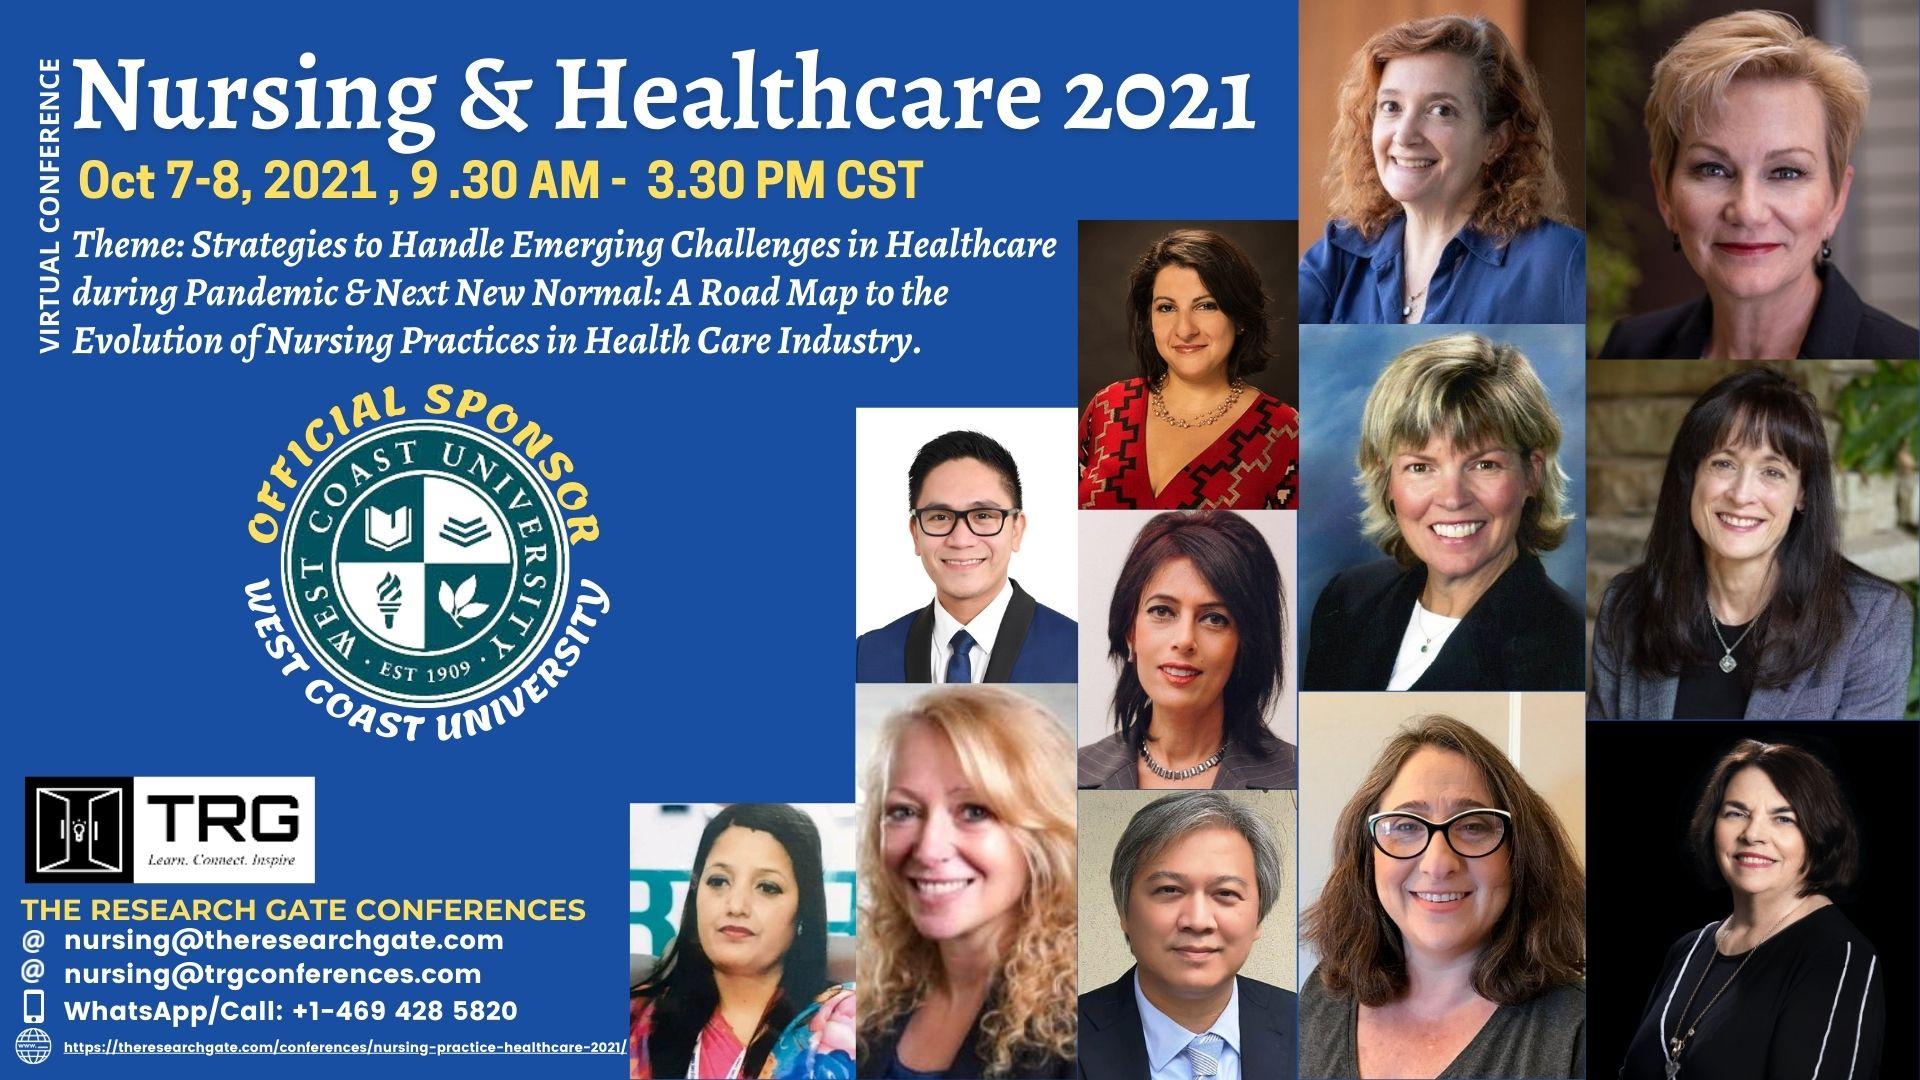 Nursing Practice & Healthcare 2021